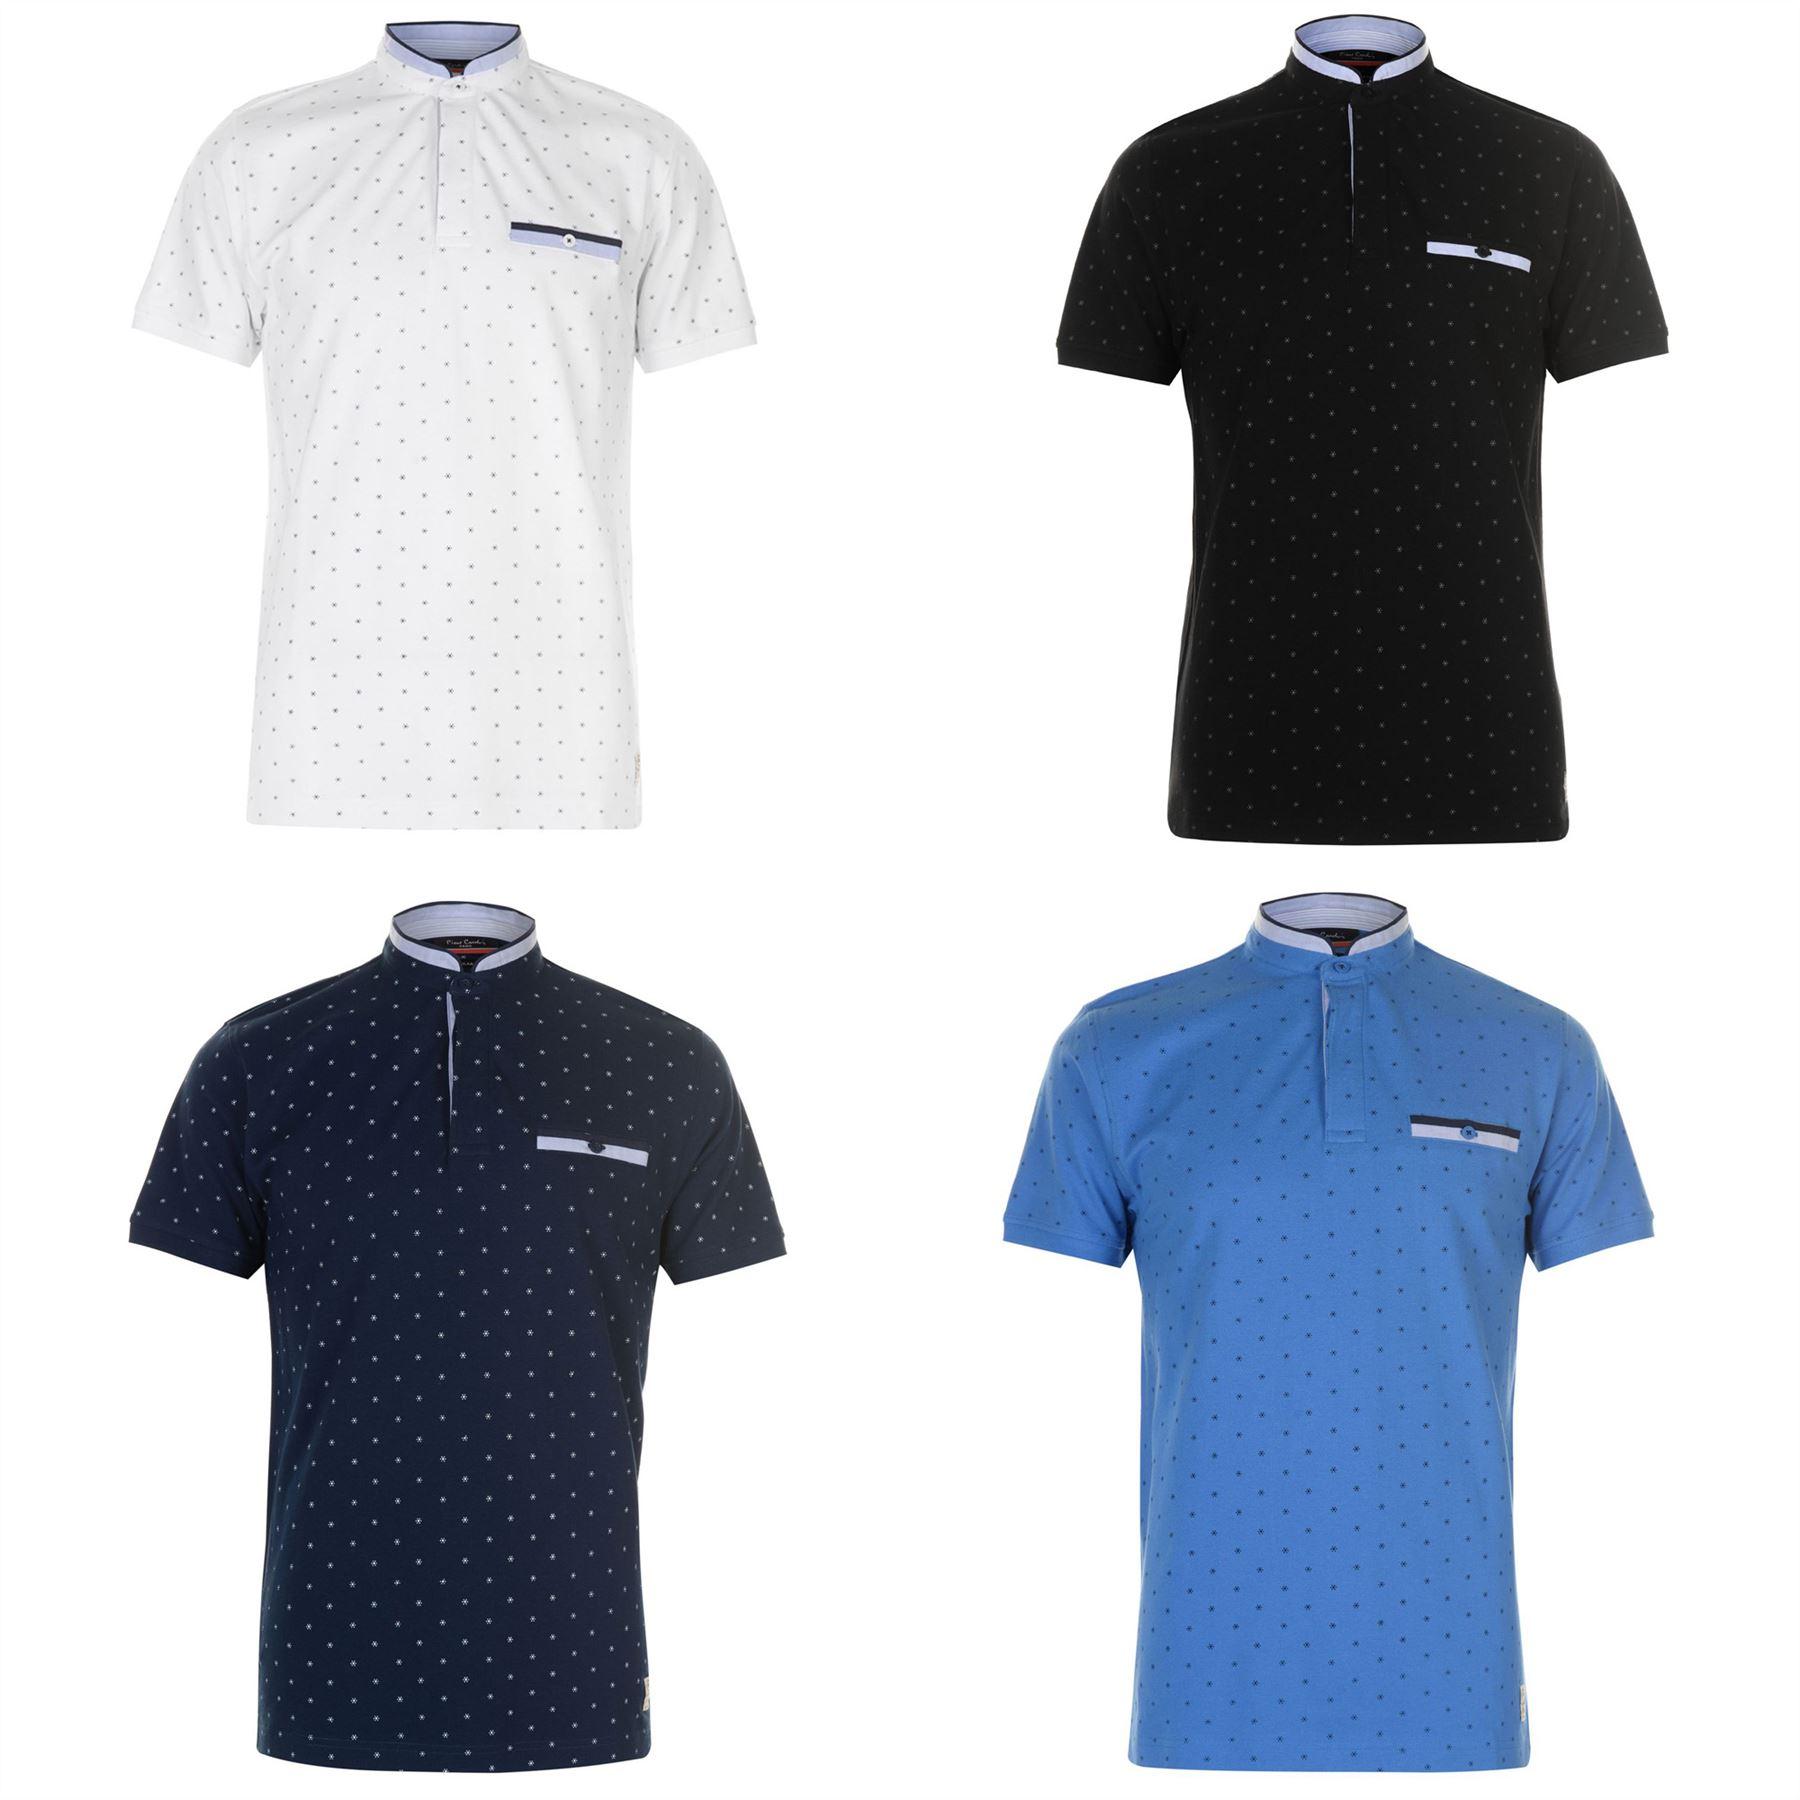 ca73b46117 ... Pierre Cardin Geometric Mandarin Collar Polo Shirt Mens Top Tee Casual  T-Shirt ...